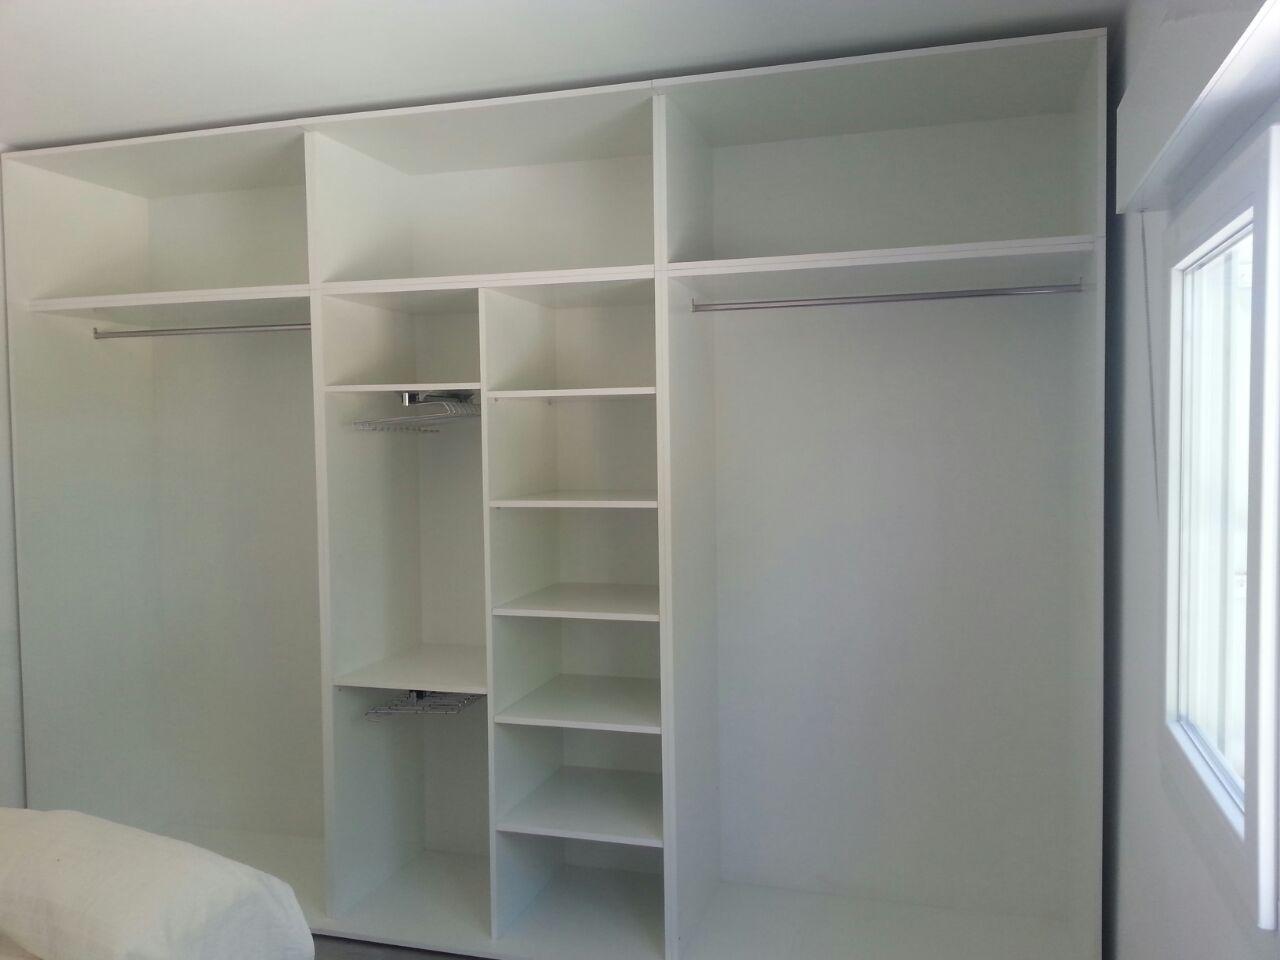 Forrado armario empotrado en blanco interiores de for Papel para forrar armarios empotrados